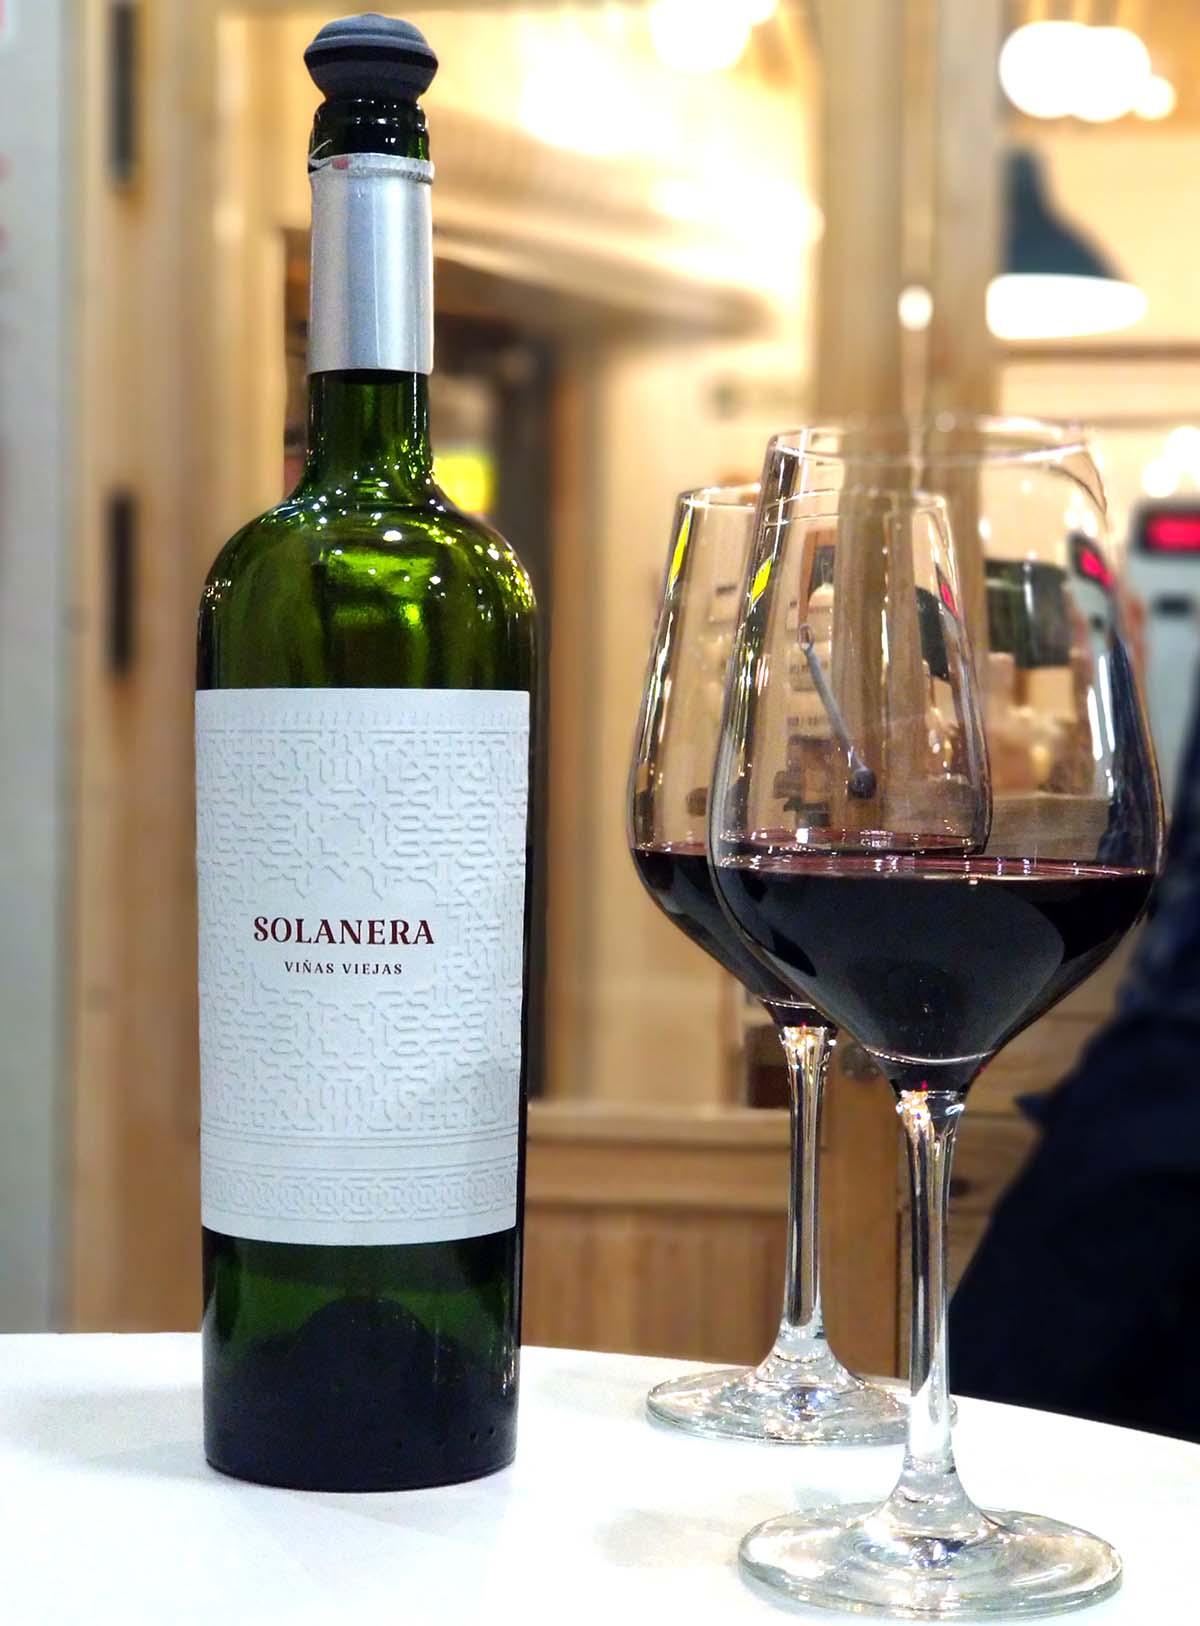 Solanera viñas viejas 2015